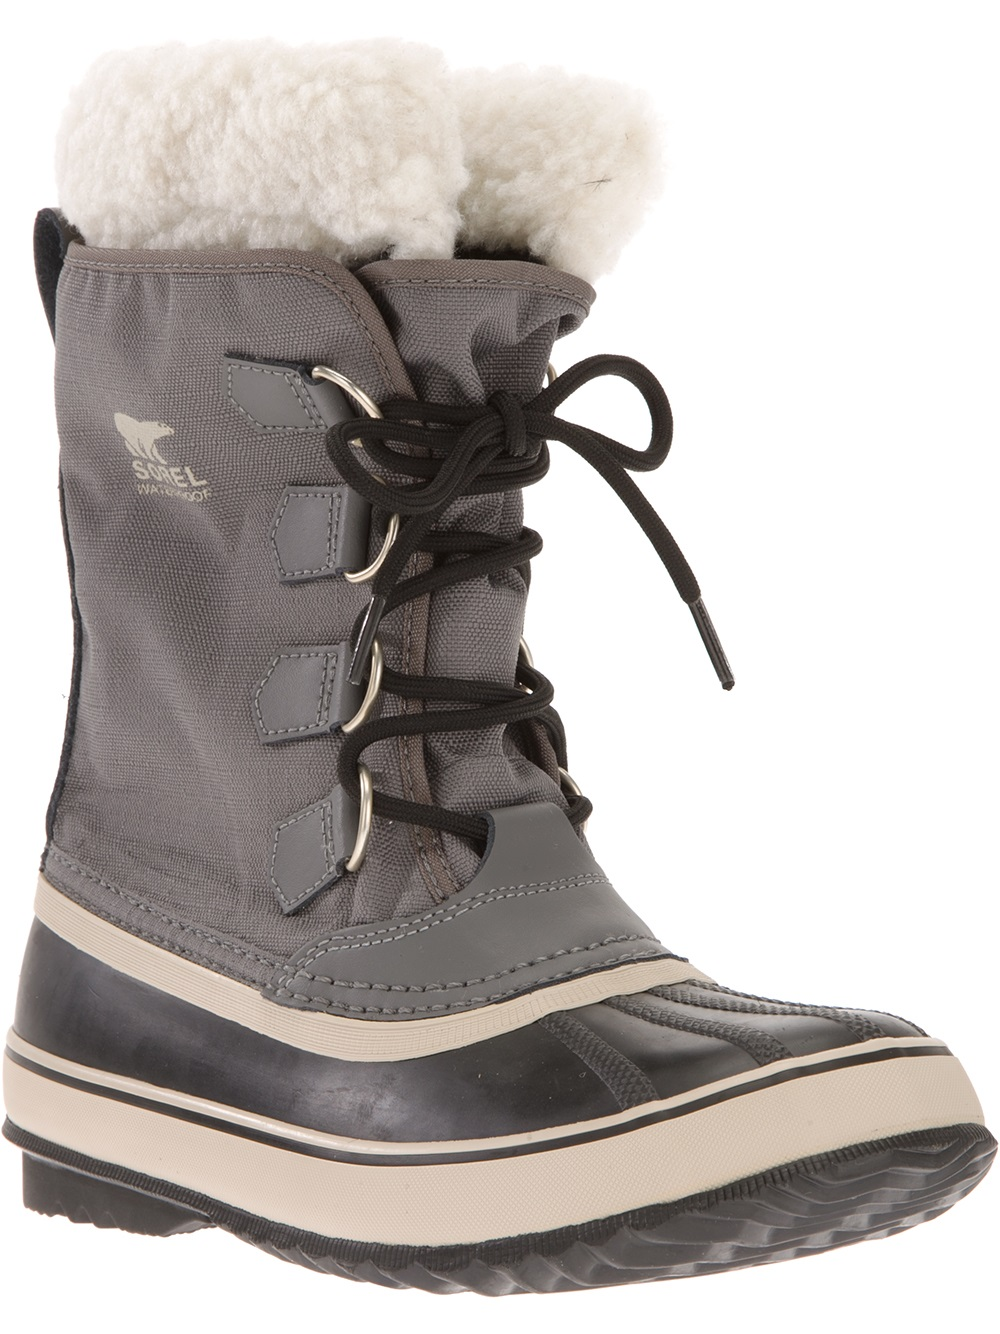 Lyst Sorel Winter Carnival Boot In Gray